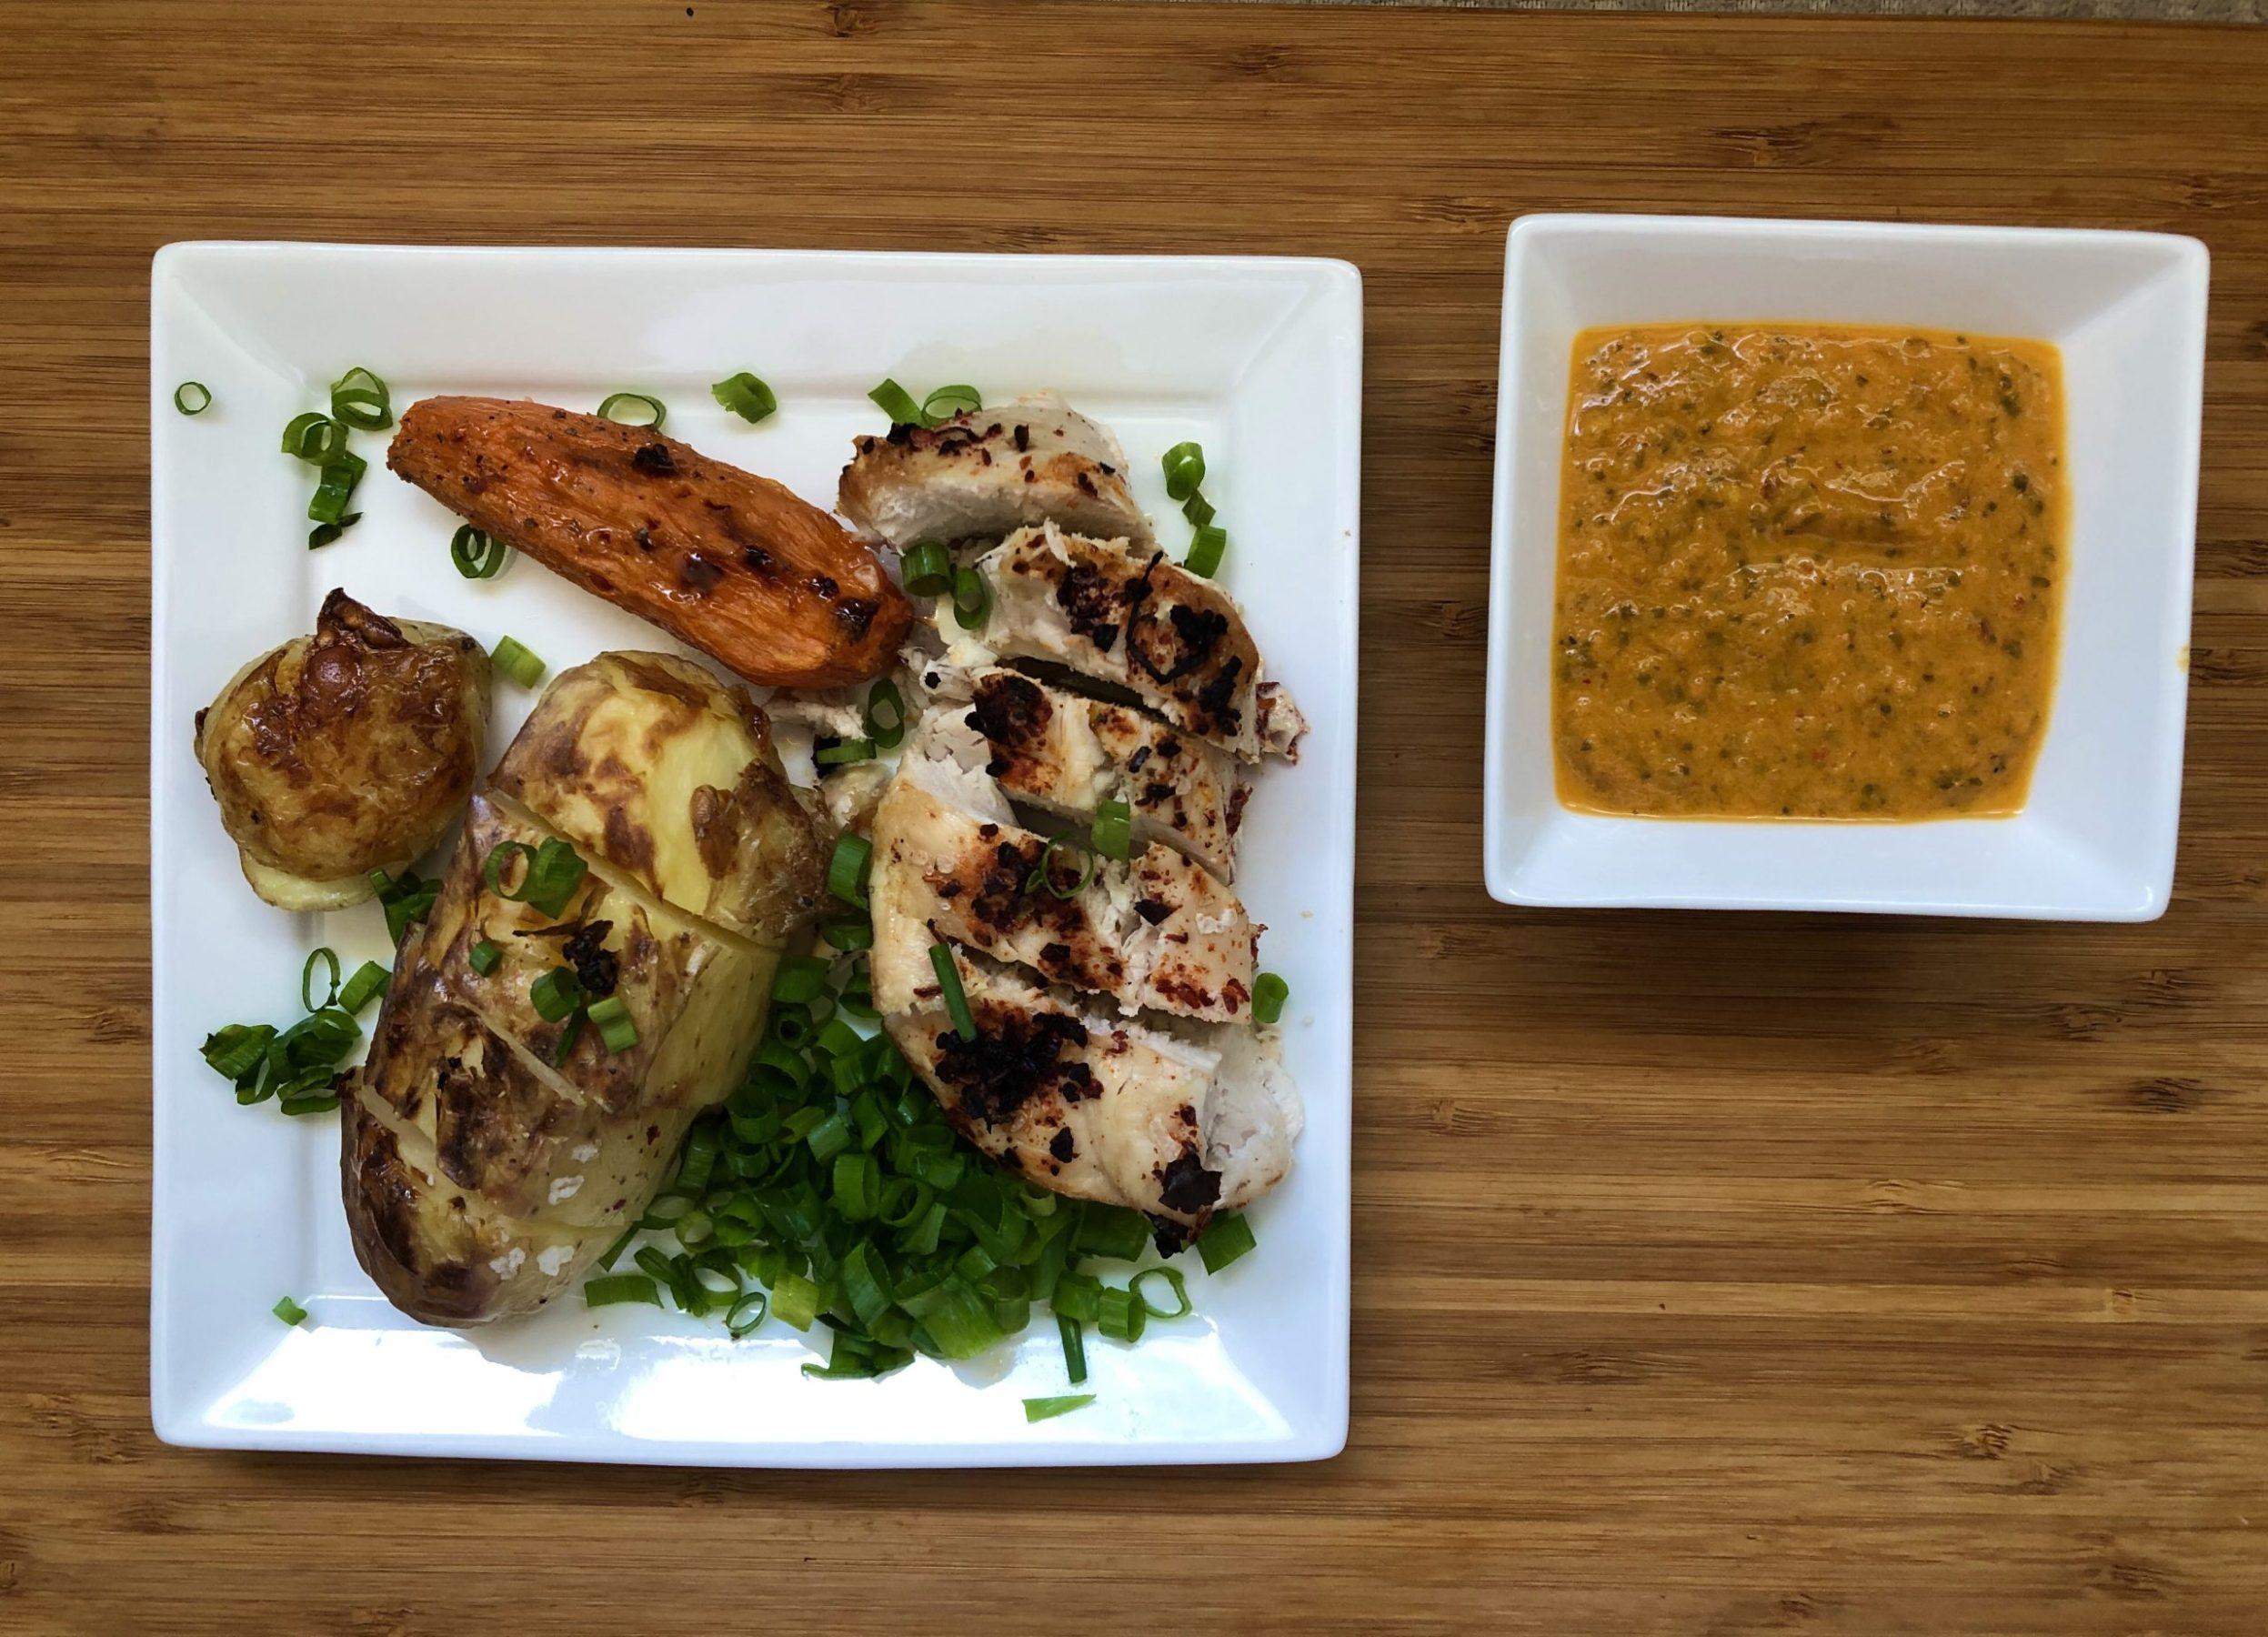 Paprika Chicken Breast and Roasted Potato Mix